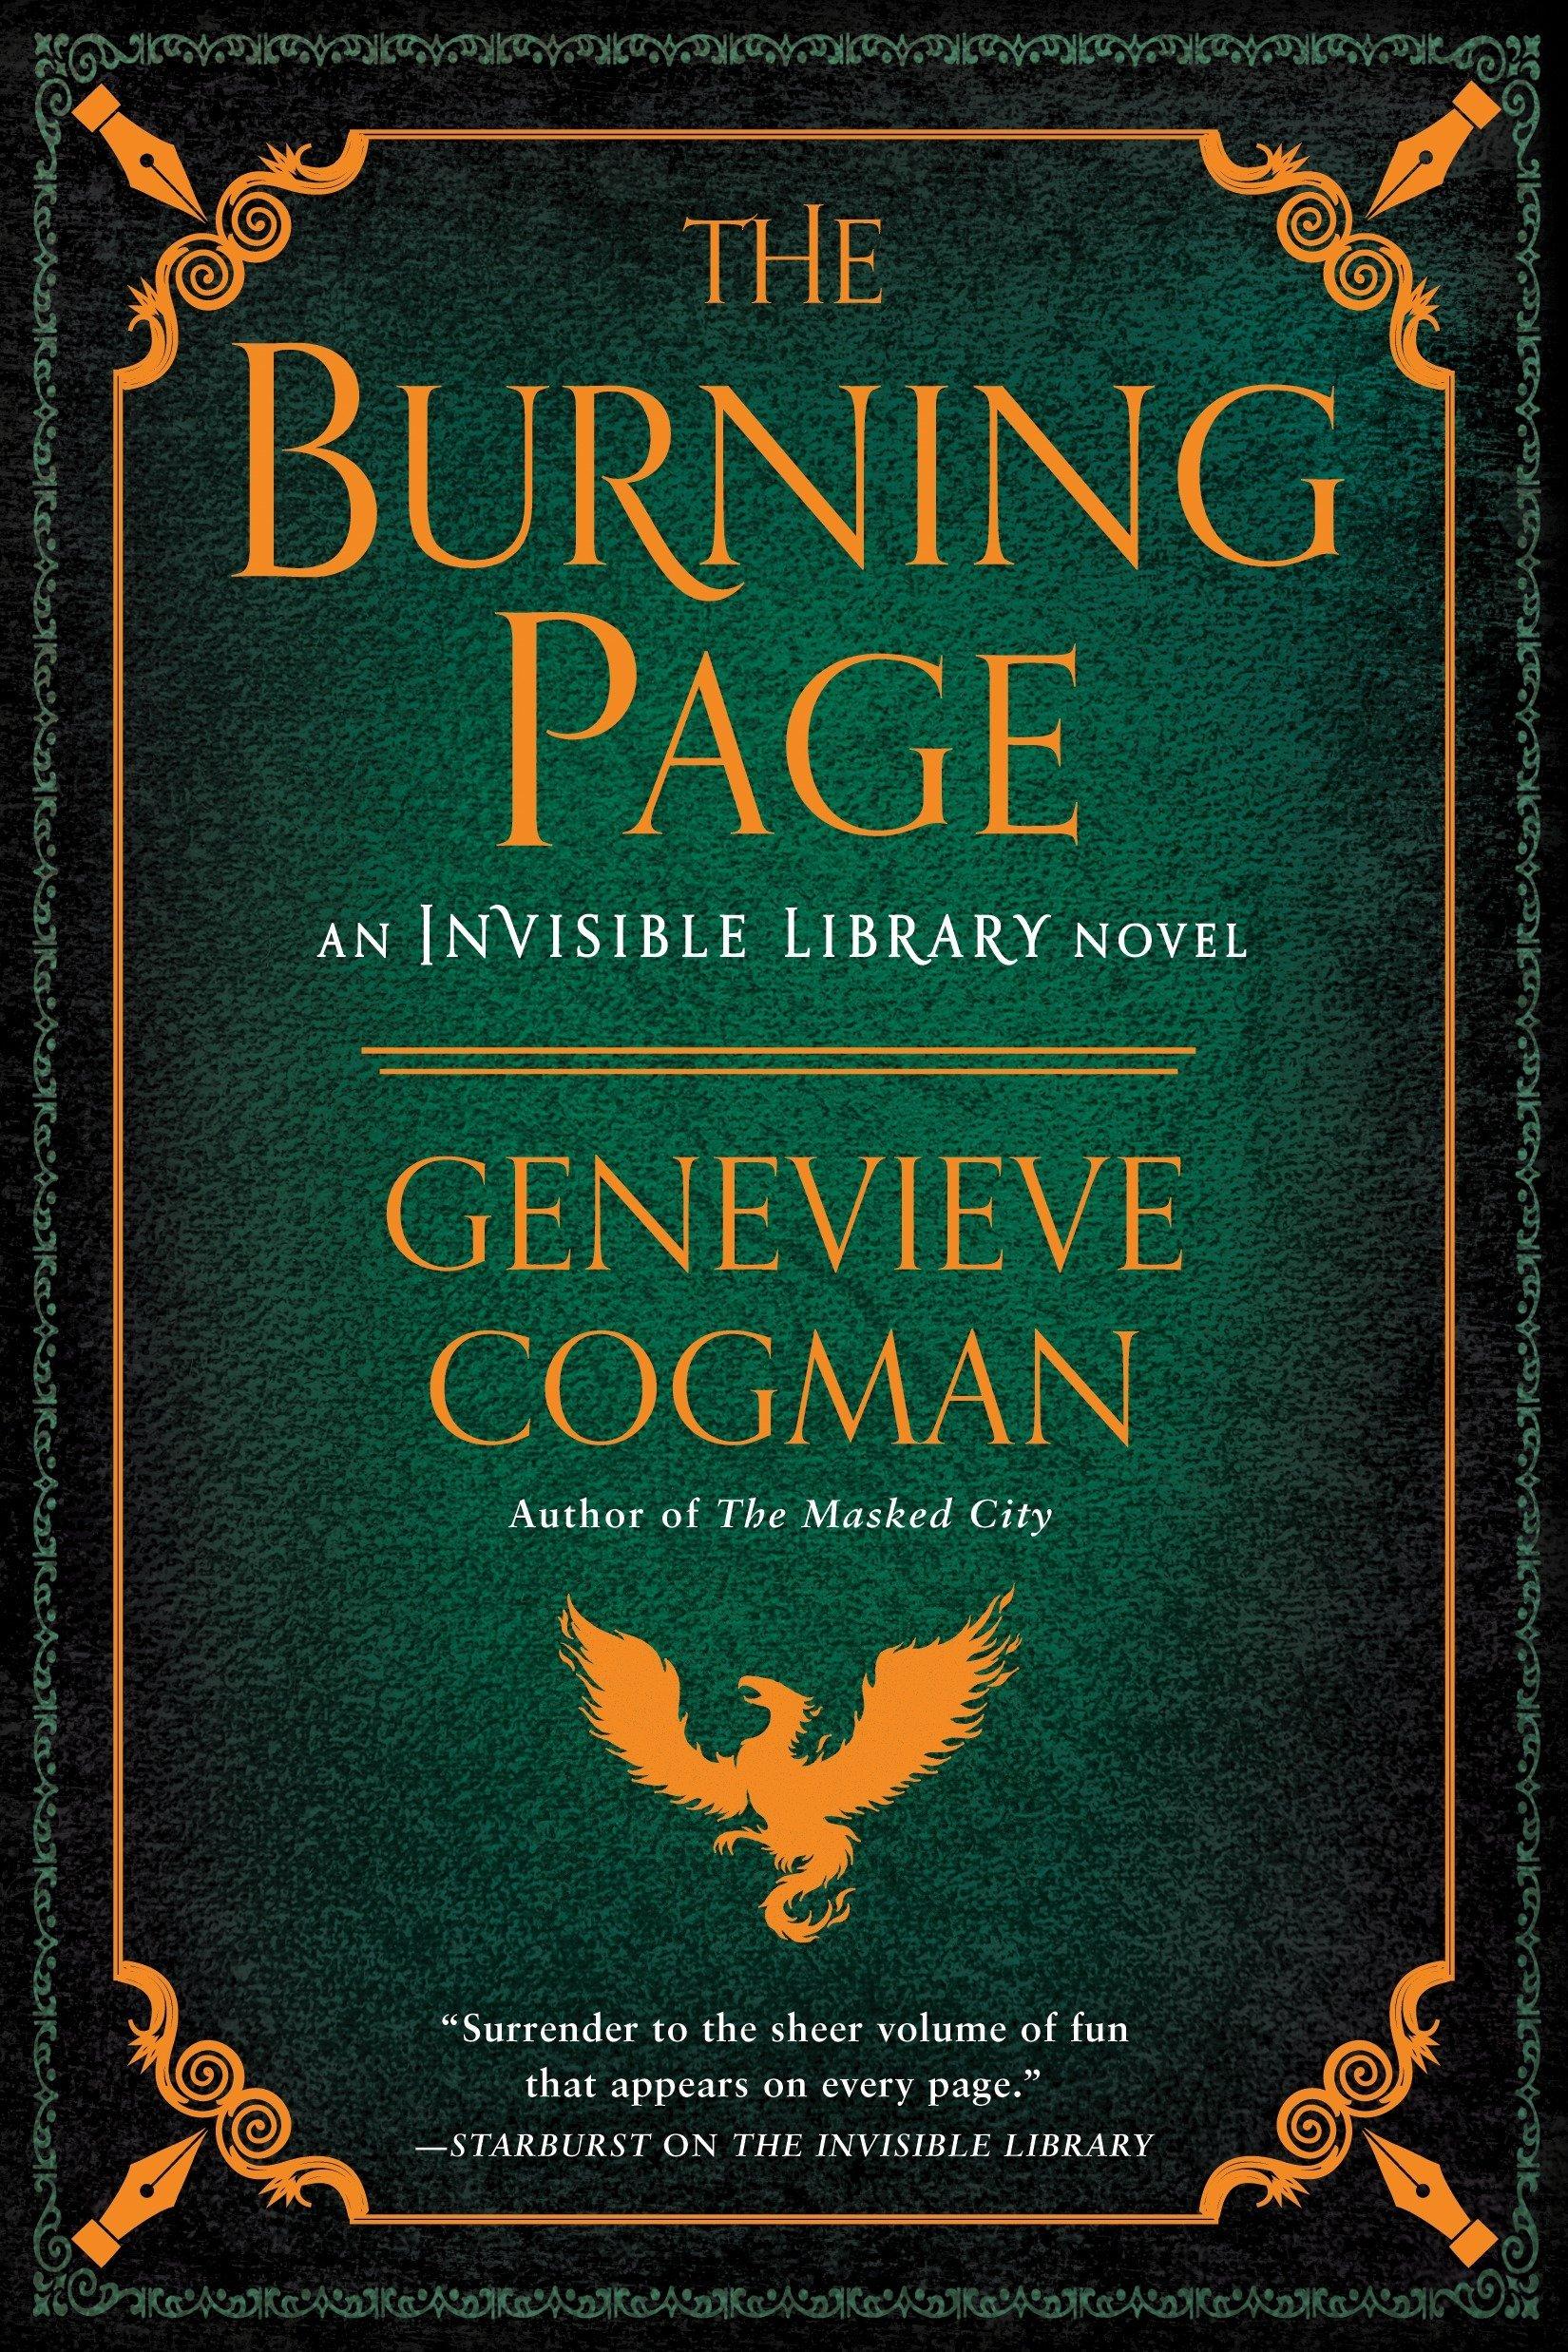 The Burning Page: Amazon.ca: Cogman, Genevieve: Books